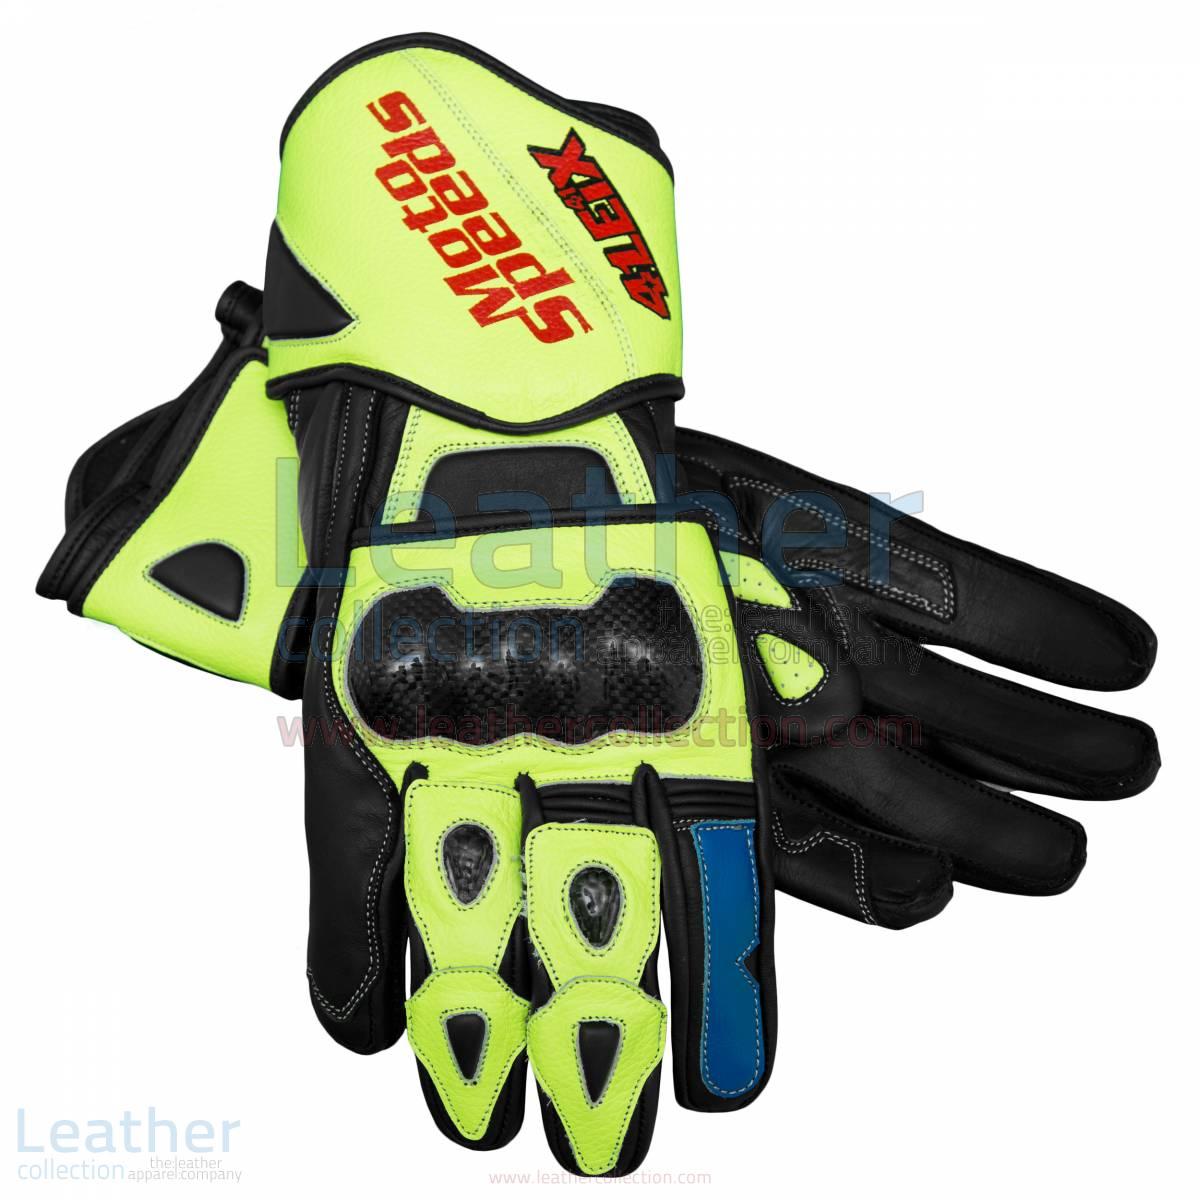 Aleix Espargaro 2015 Motorbike Race Gloves